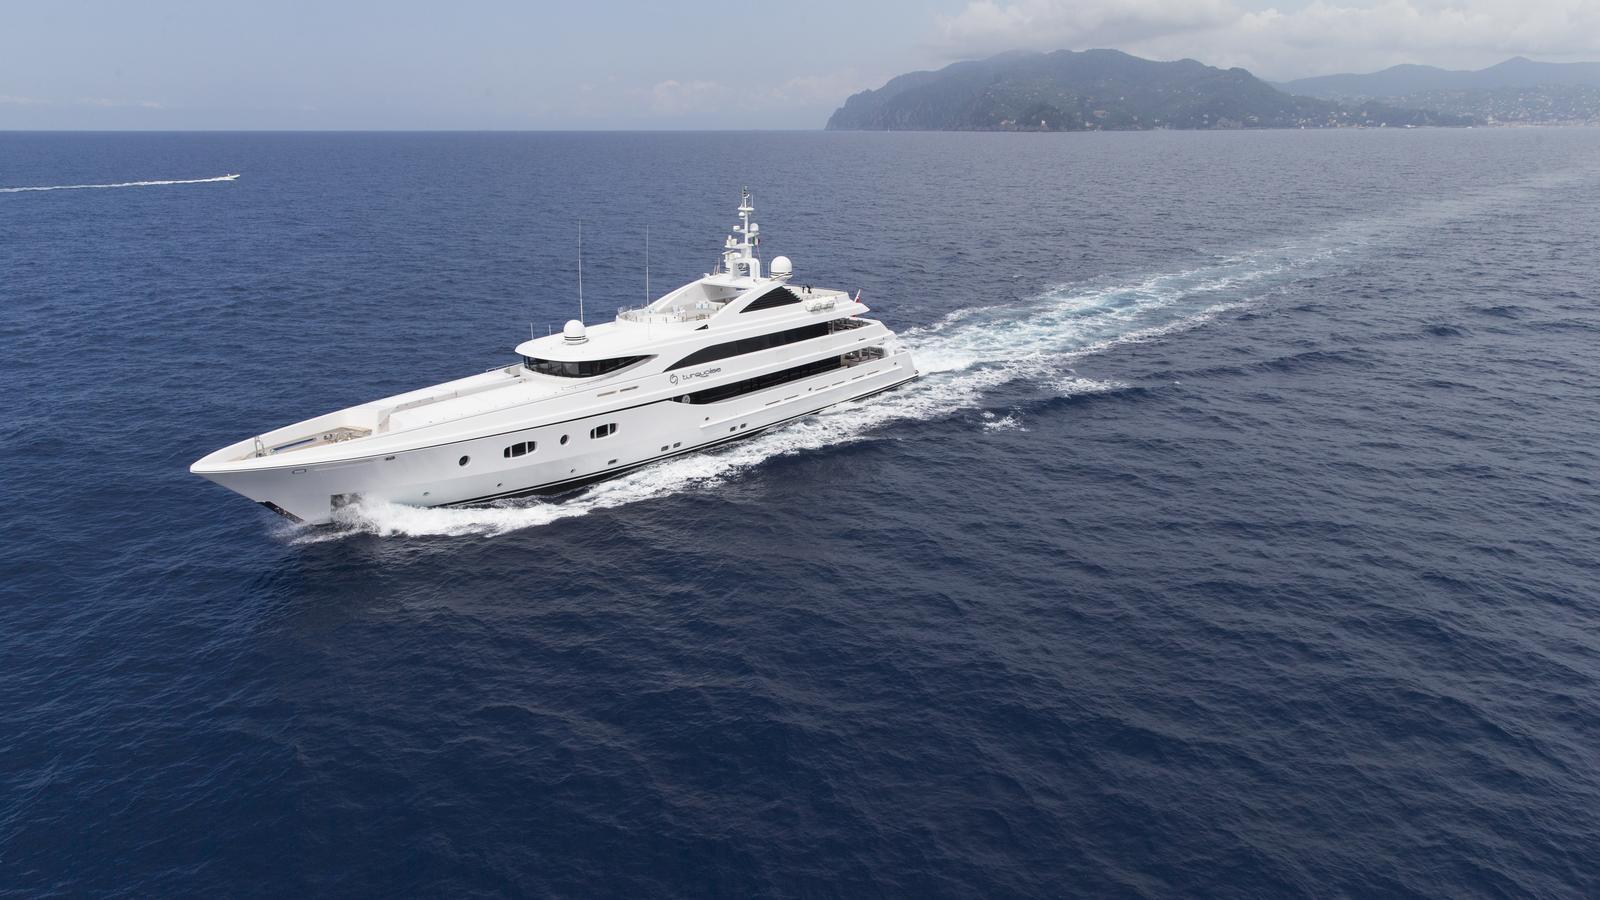 turquoise-motor-yacht-2011-45m-cruising